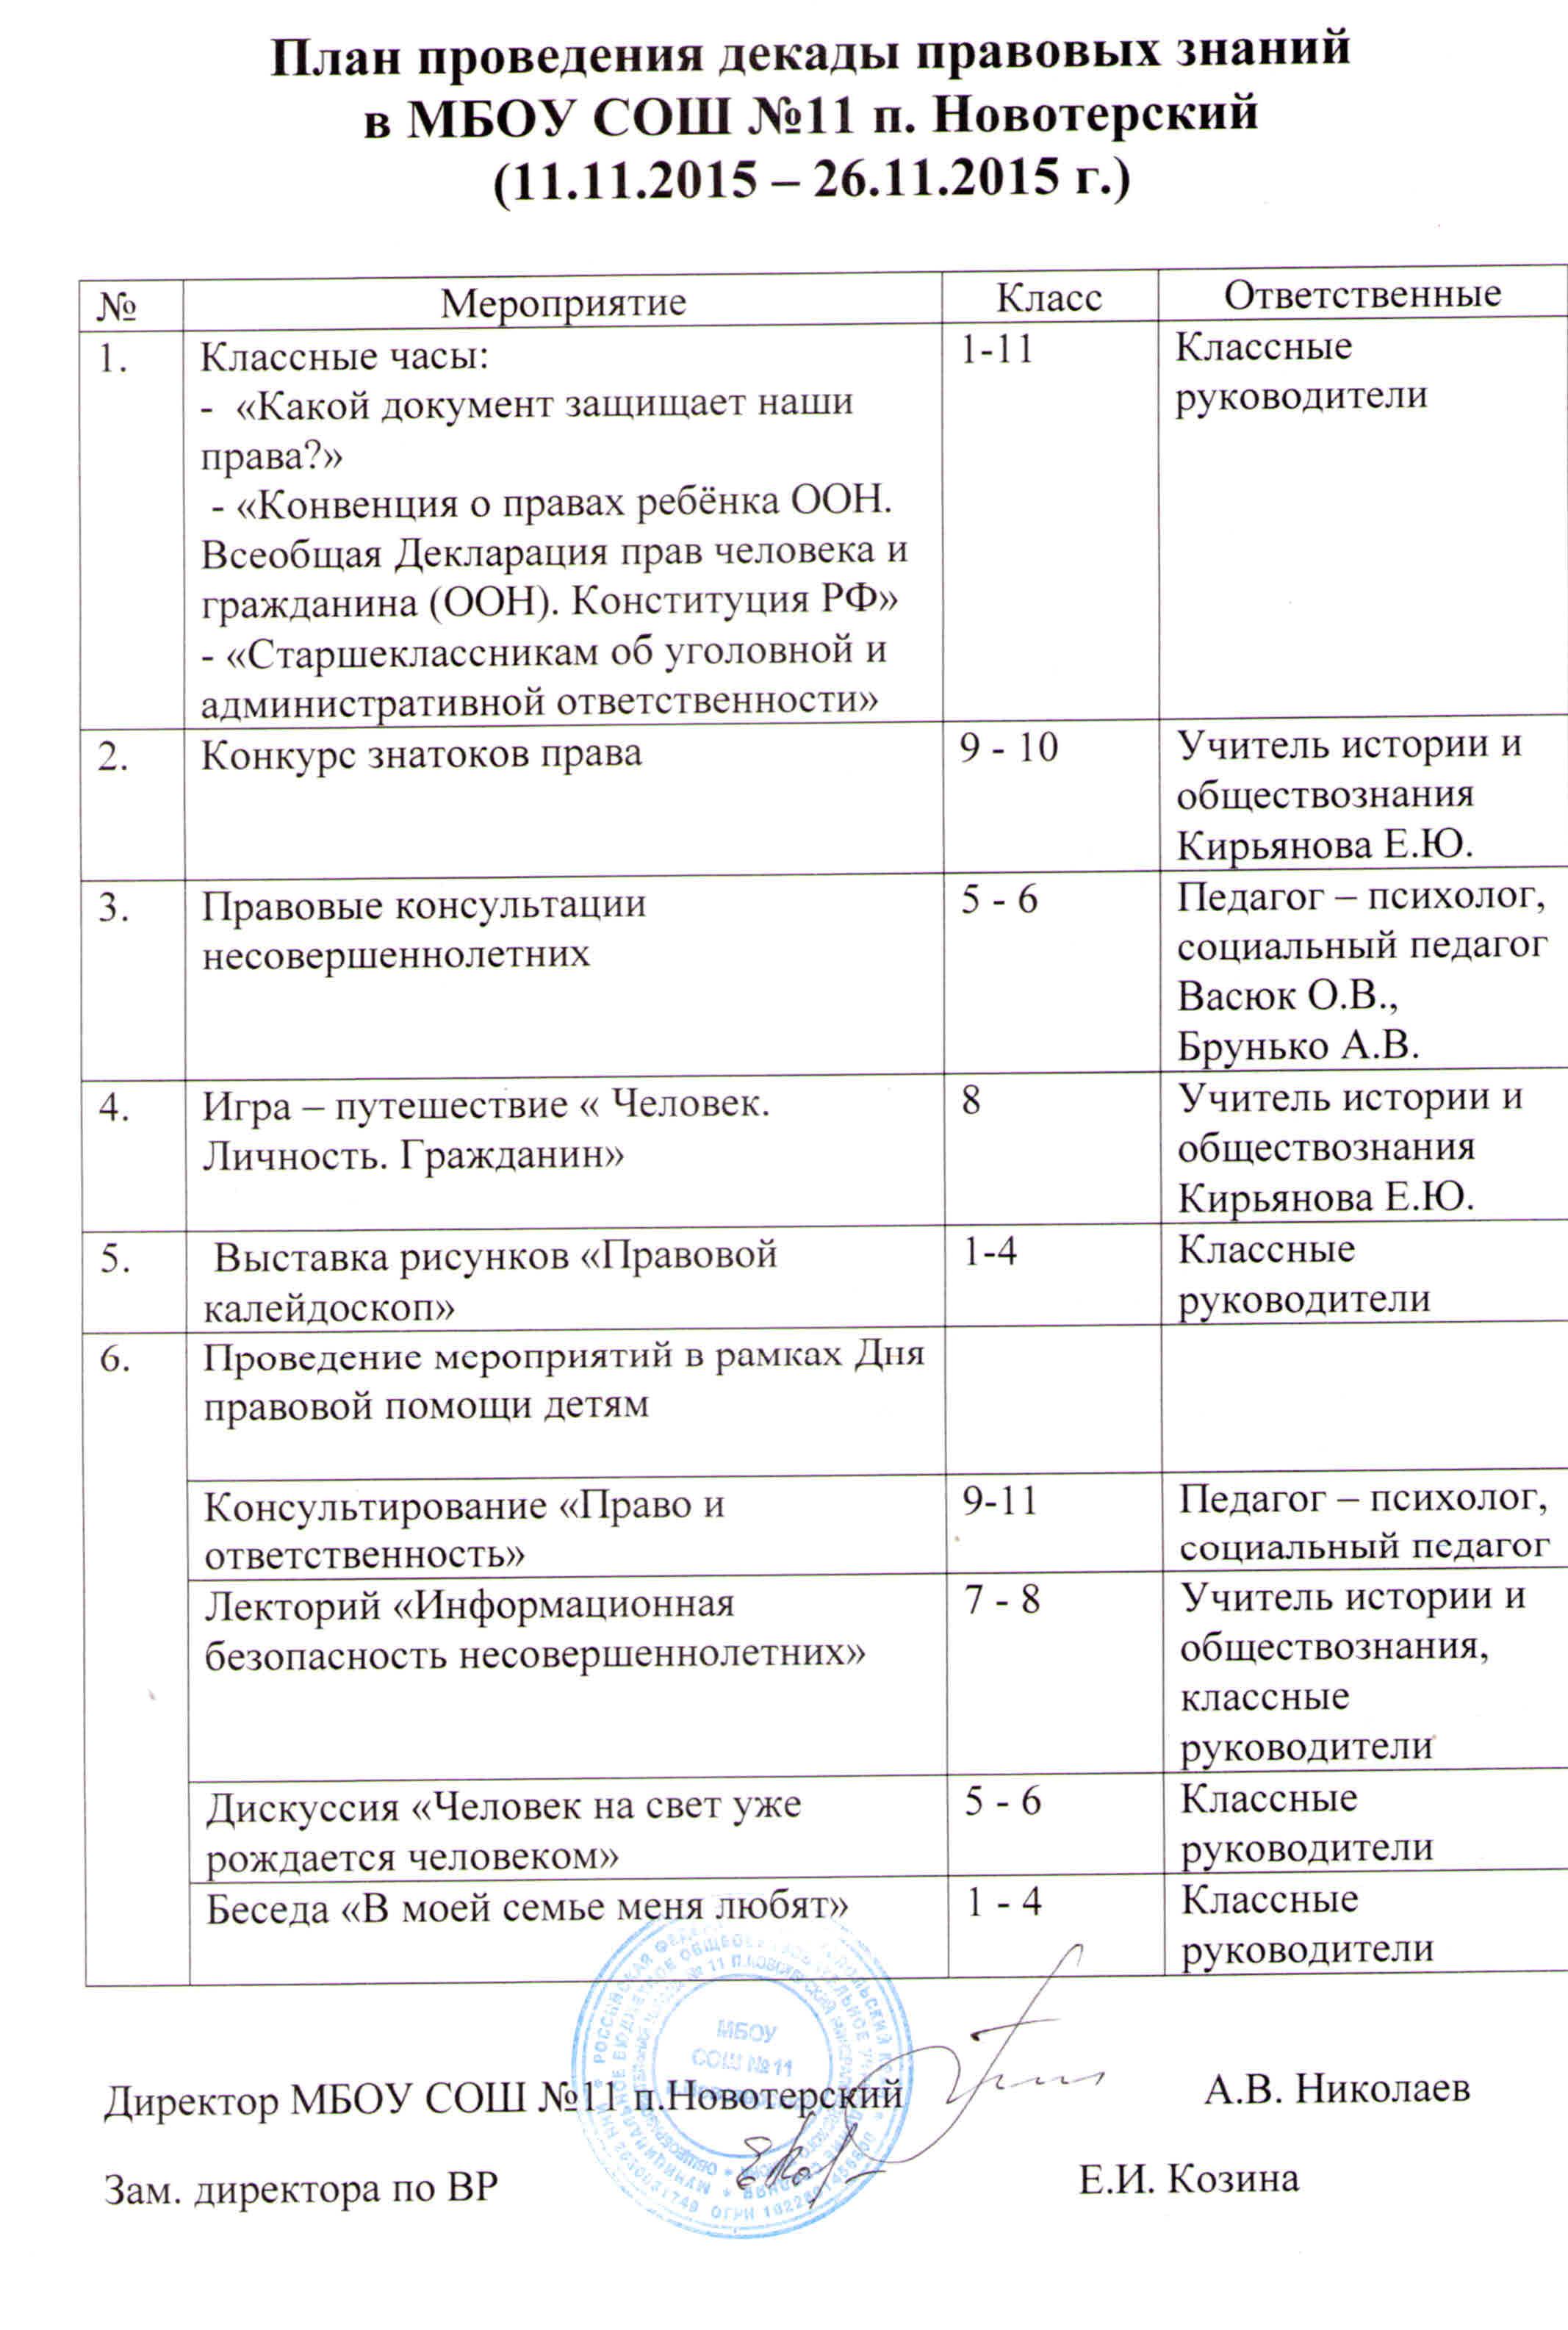 C:\Users\Сергей\Desktop\декада\Document_12.jpg